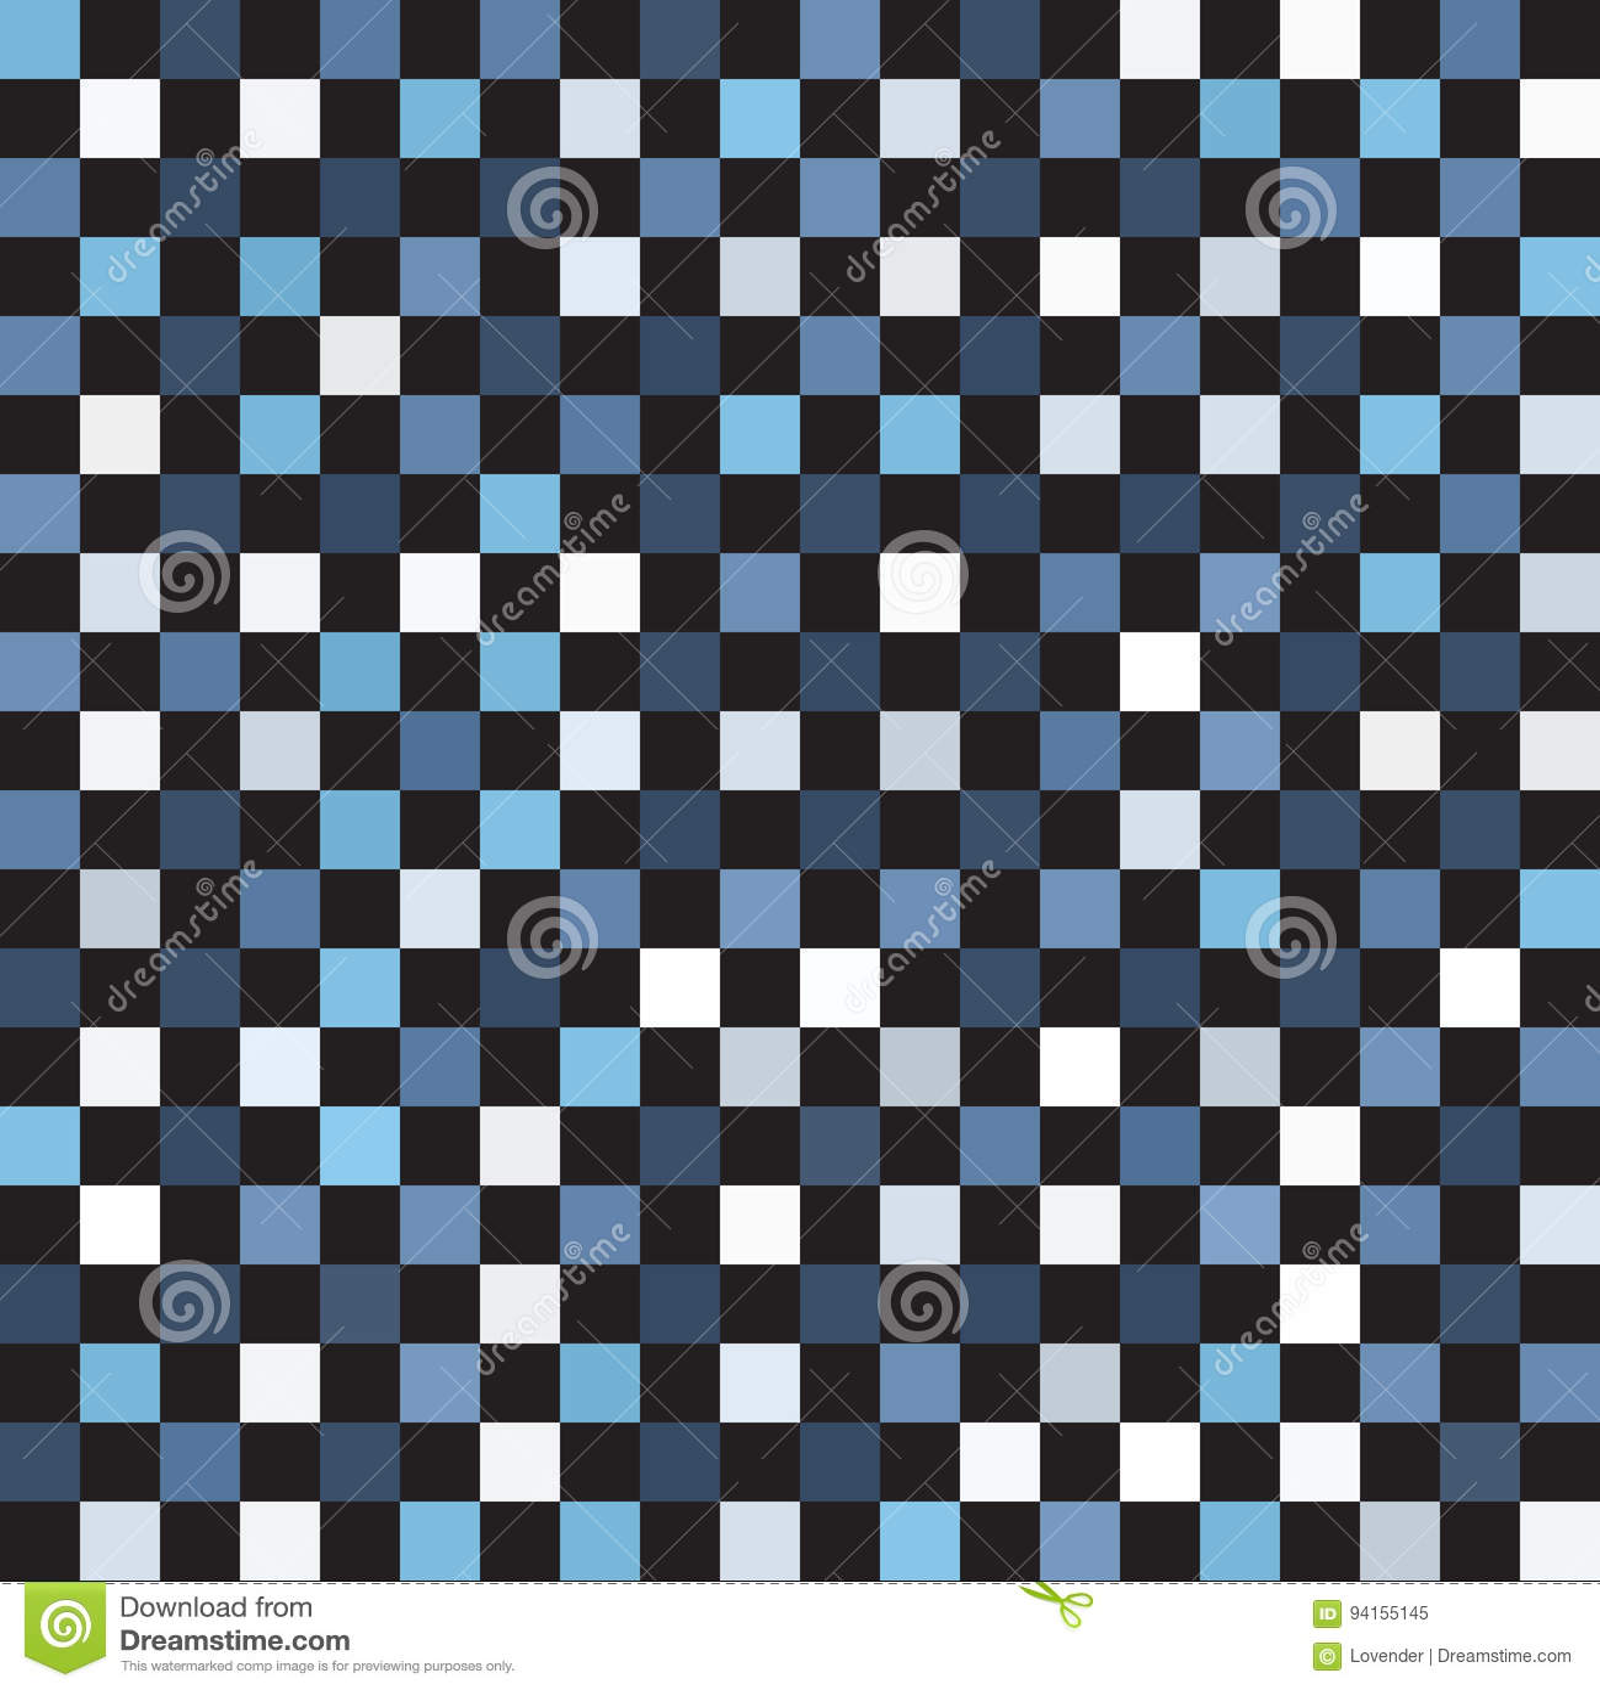 Checkered Design Square Checkered Pattern Seamless Vector Checkerboard Stock